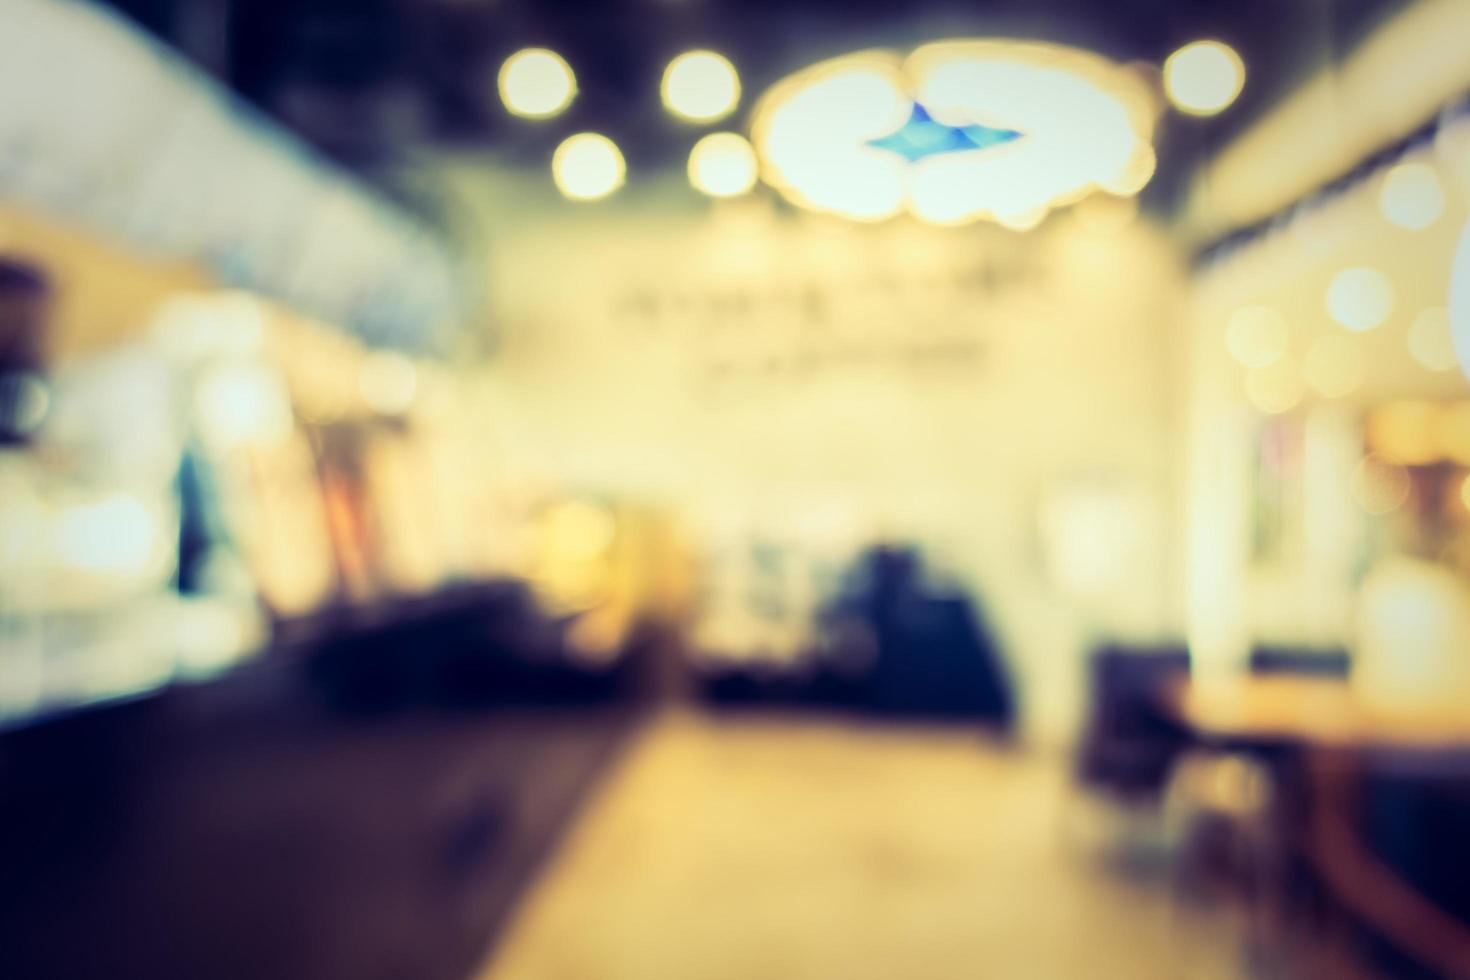 abstract intreepupil coffeeshop interieur voor achtergrond foto